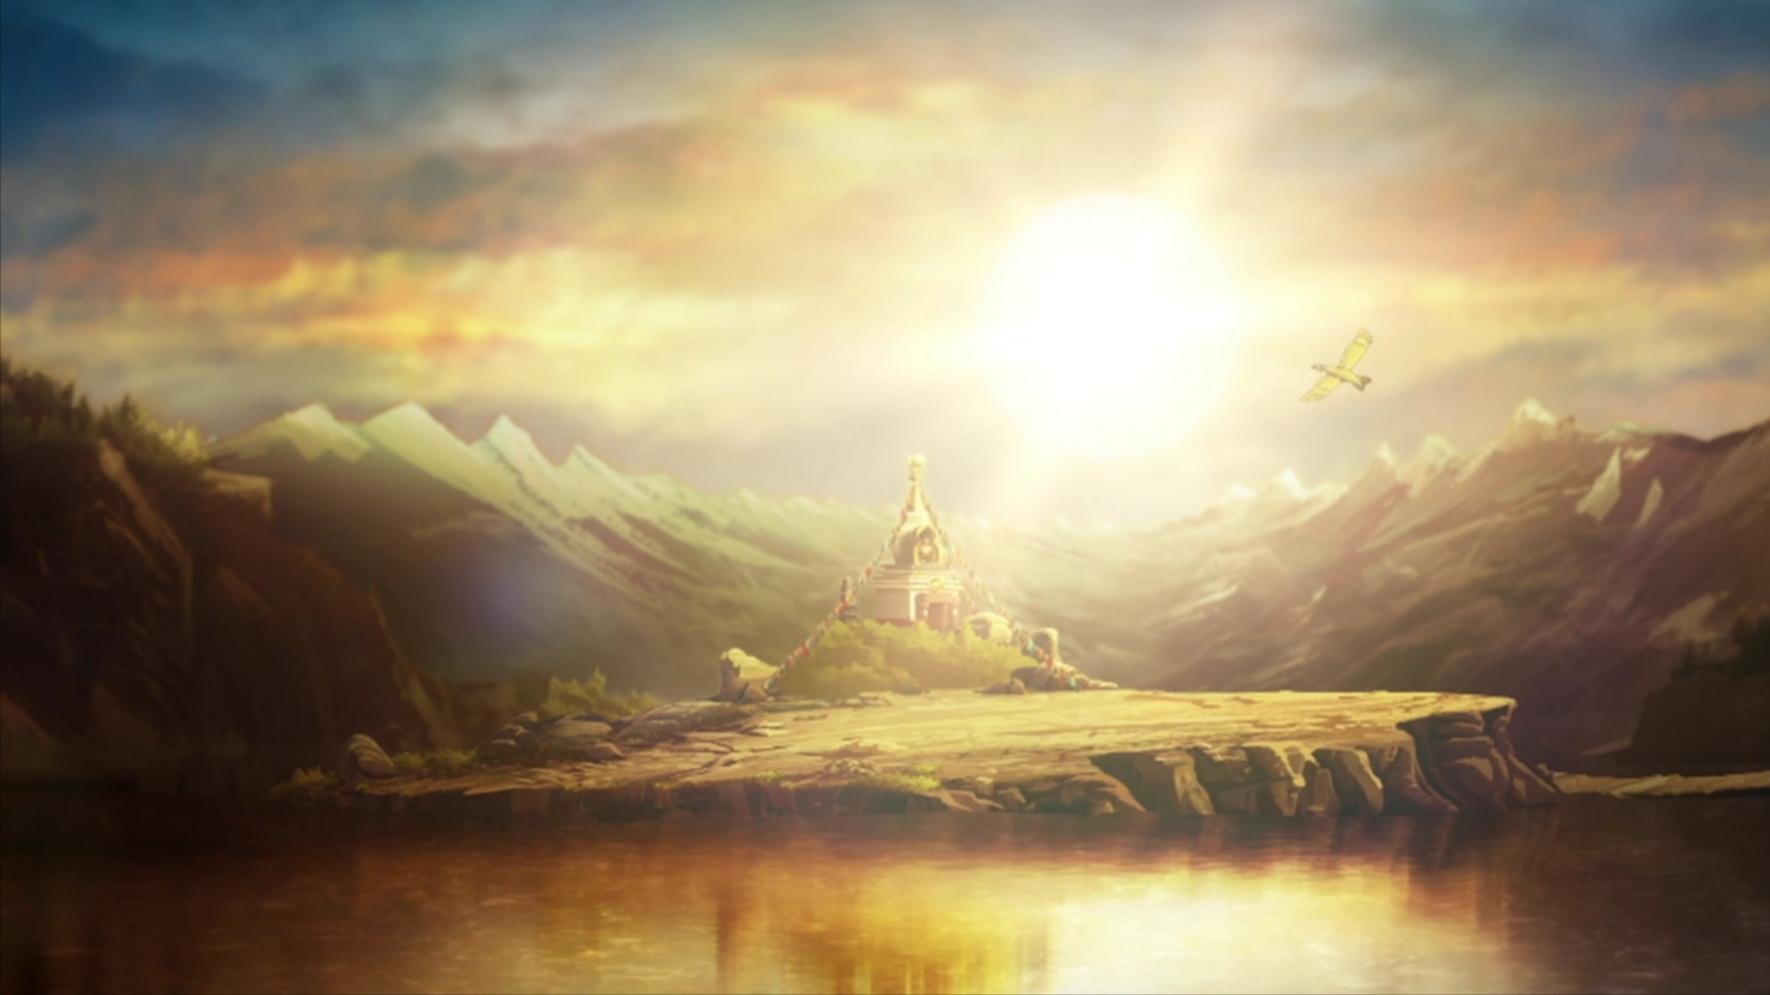 The Mysterious Cities of Gold Season 3 © DIC, Fabulus Films, Blue Spirit, Movie-Plus Group